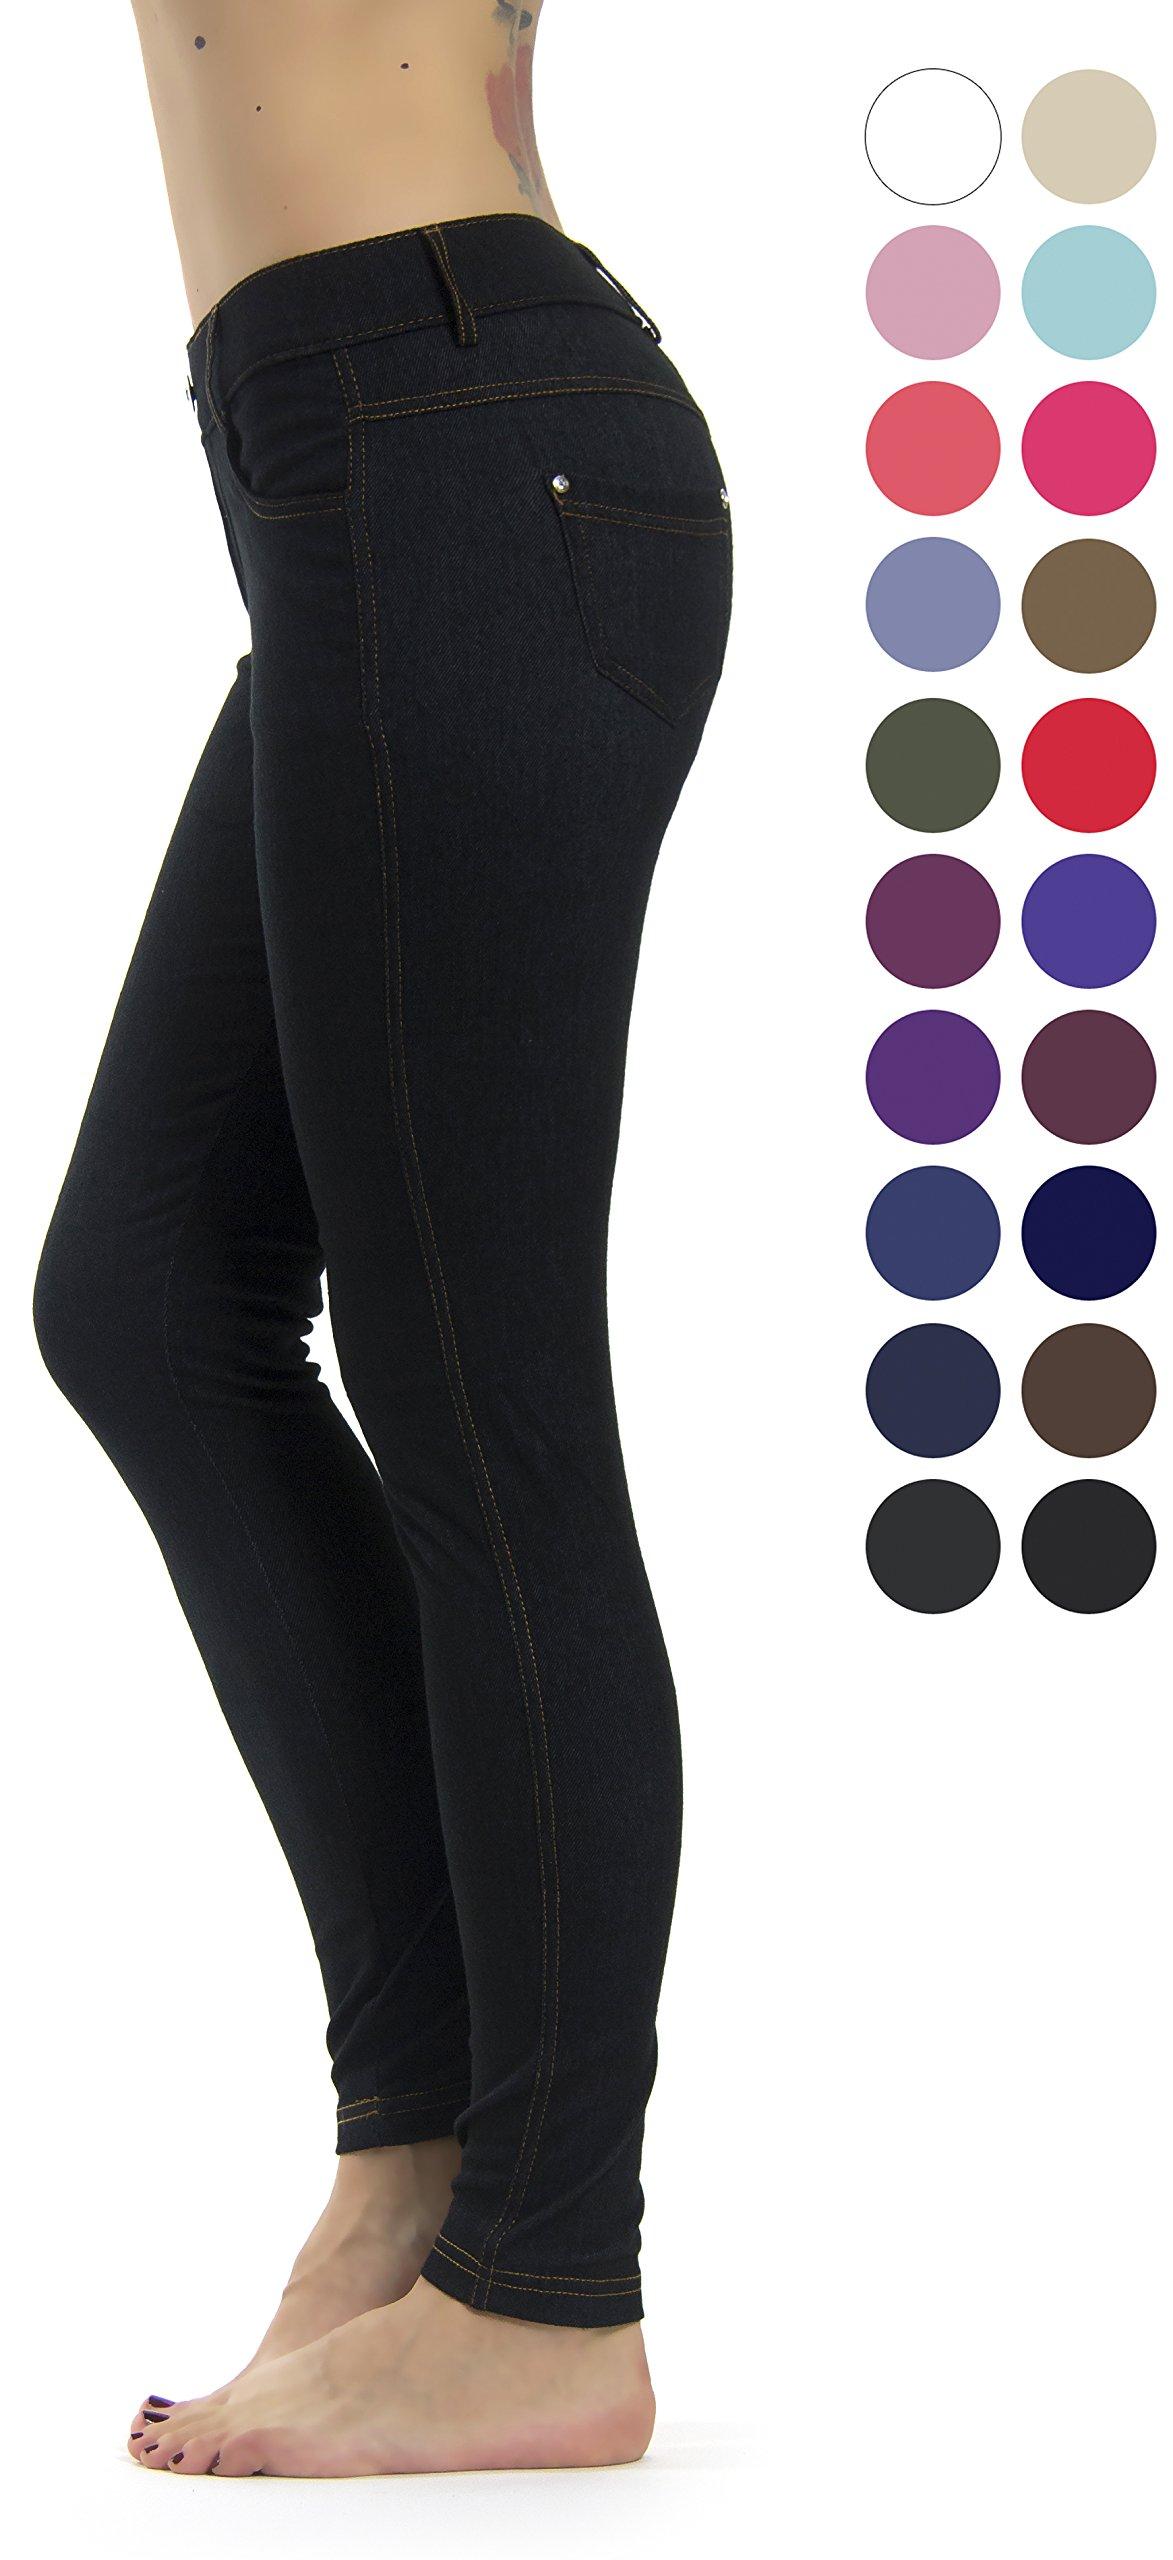 Prolific Health Women's Jean Look Jeggings Tights Slimming Many Colors Spandex Leggings Pants S-XXXL (Large/X-Large, Black Denim)